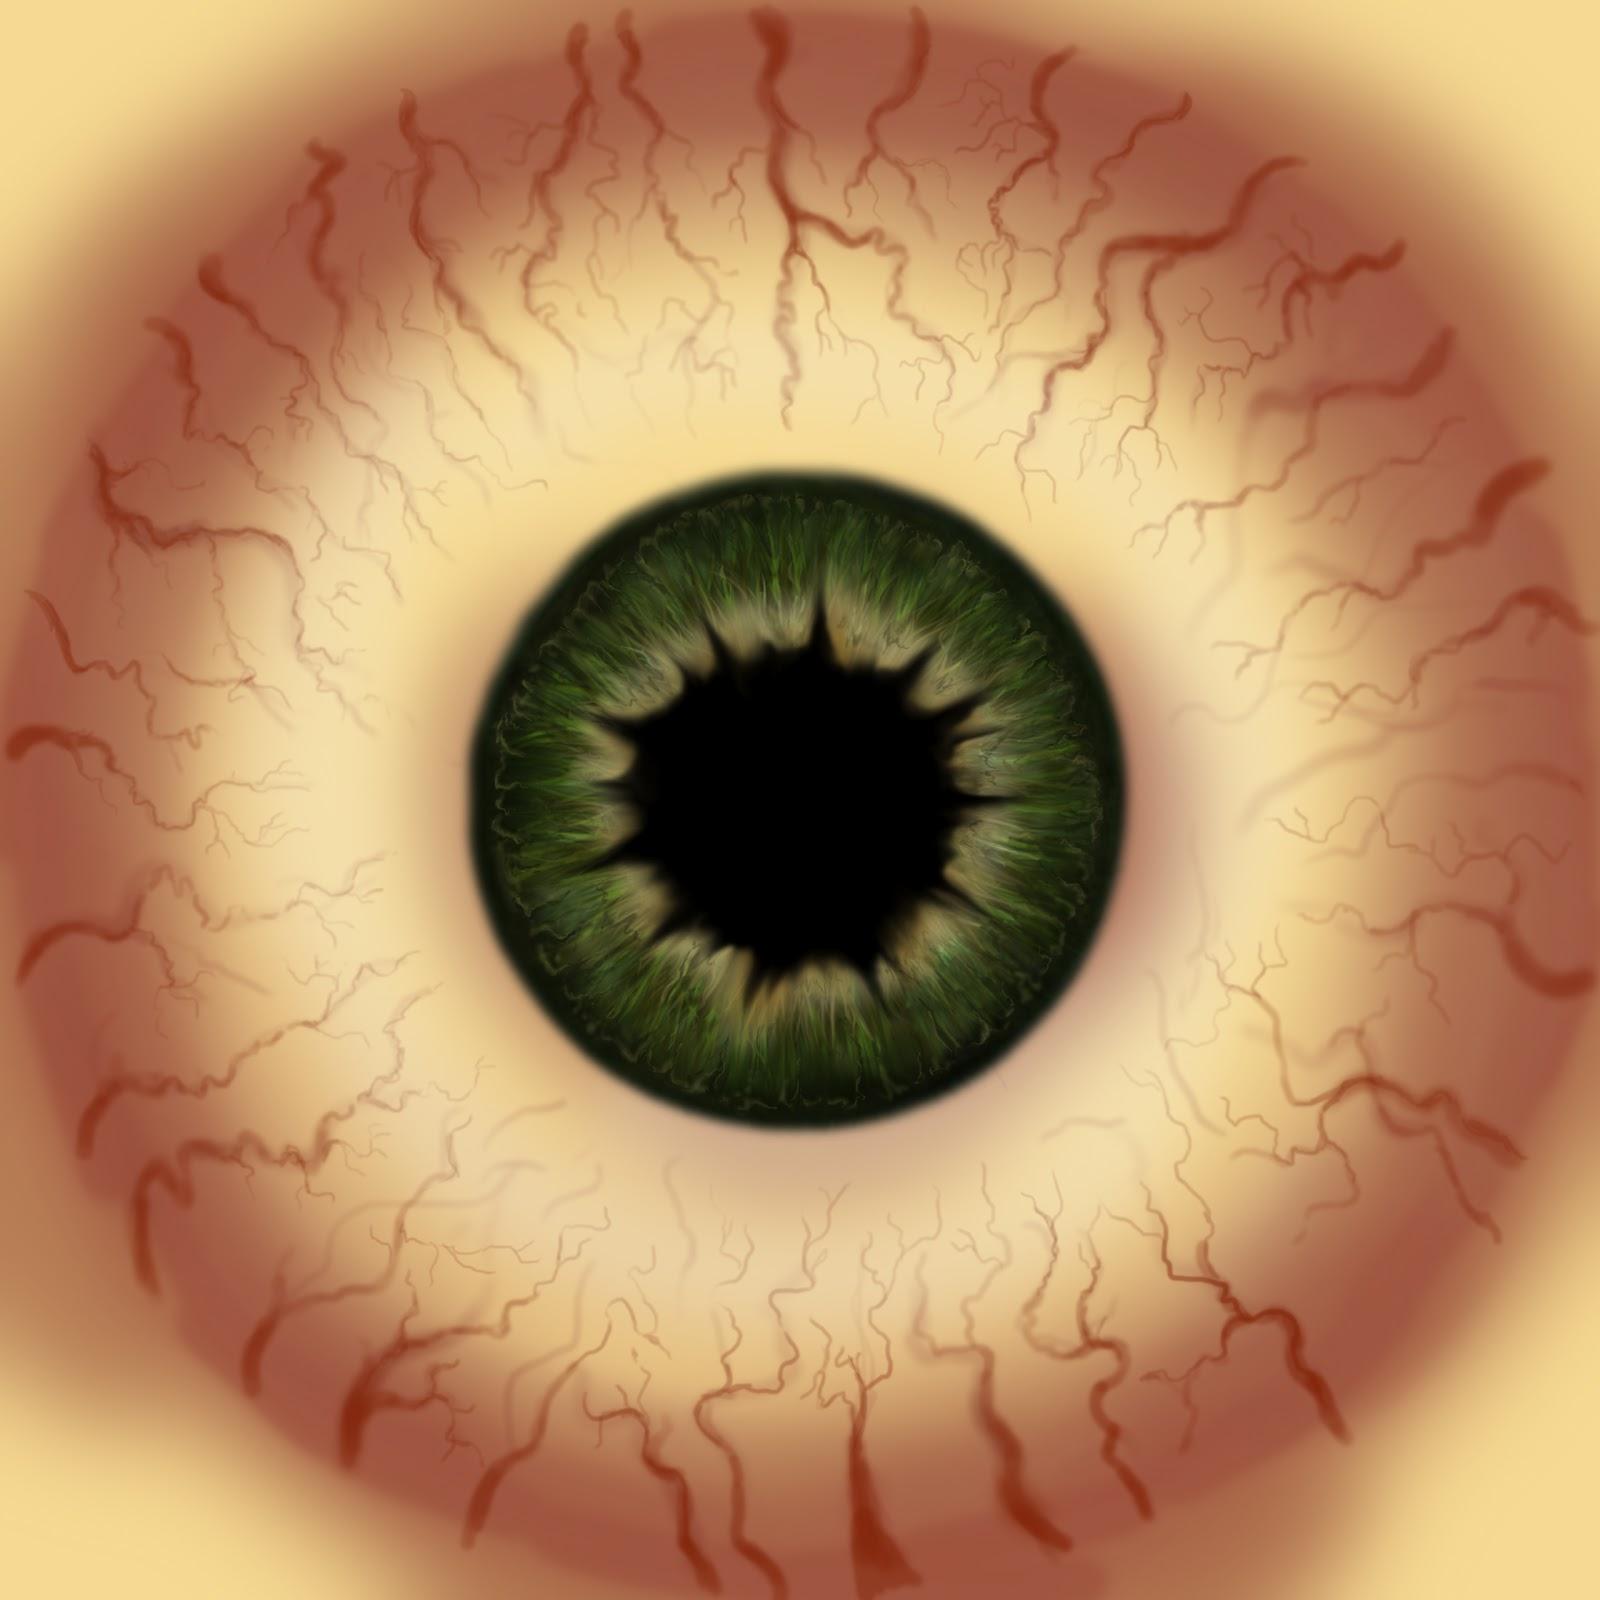 textura_olho_verde___green_eye_texture_by_axelmuller ...